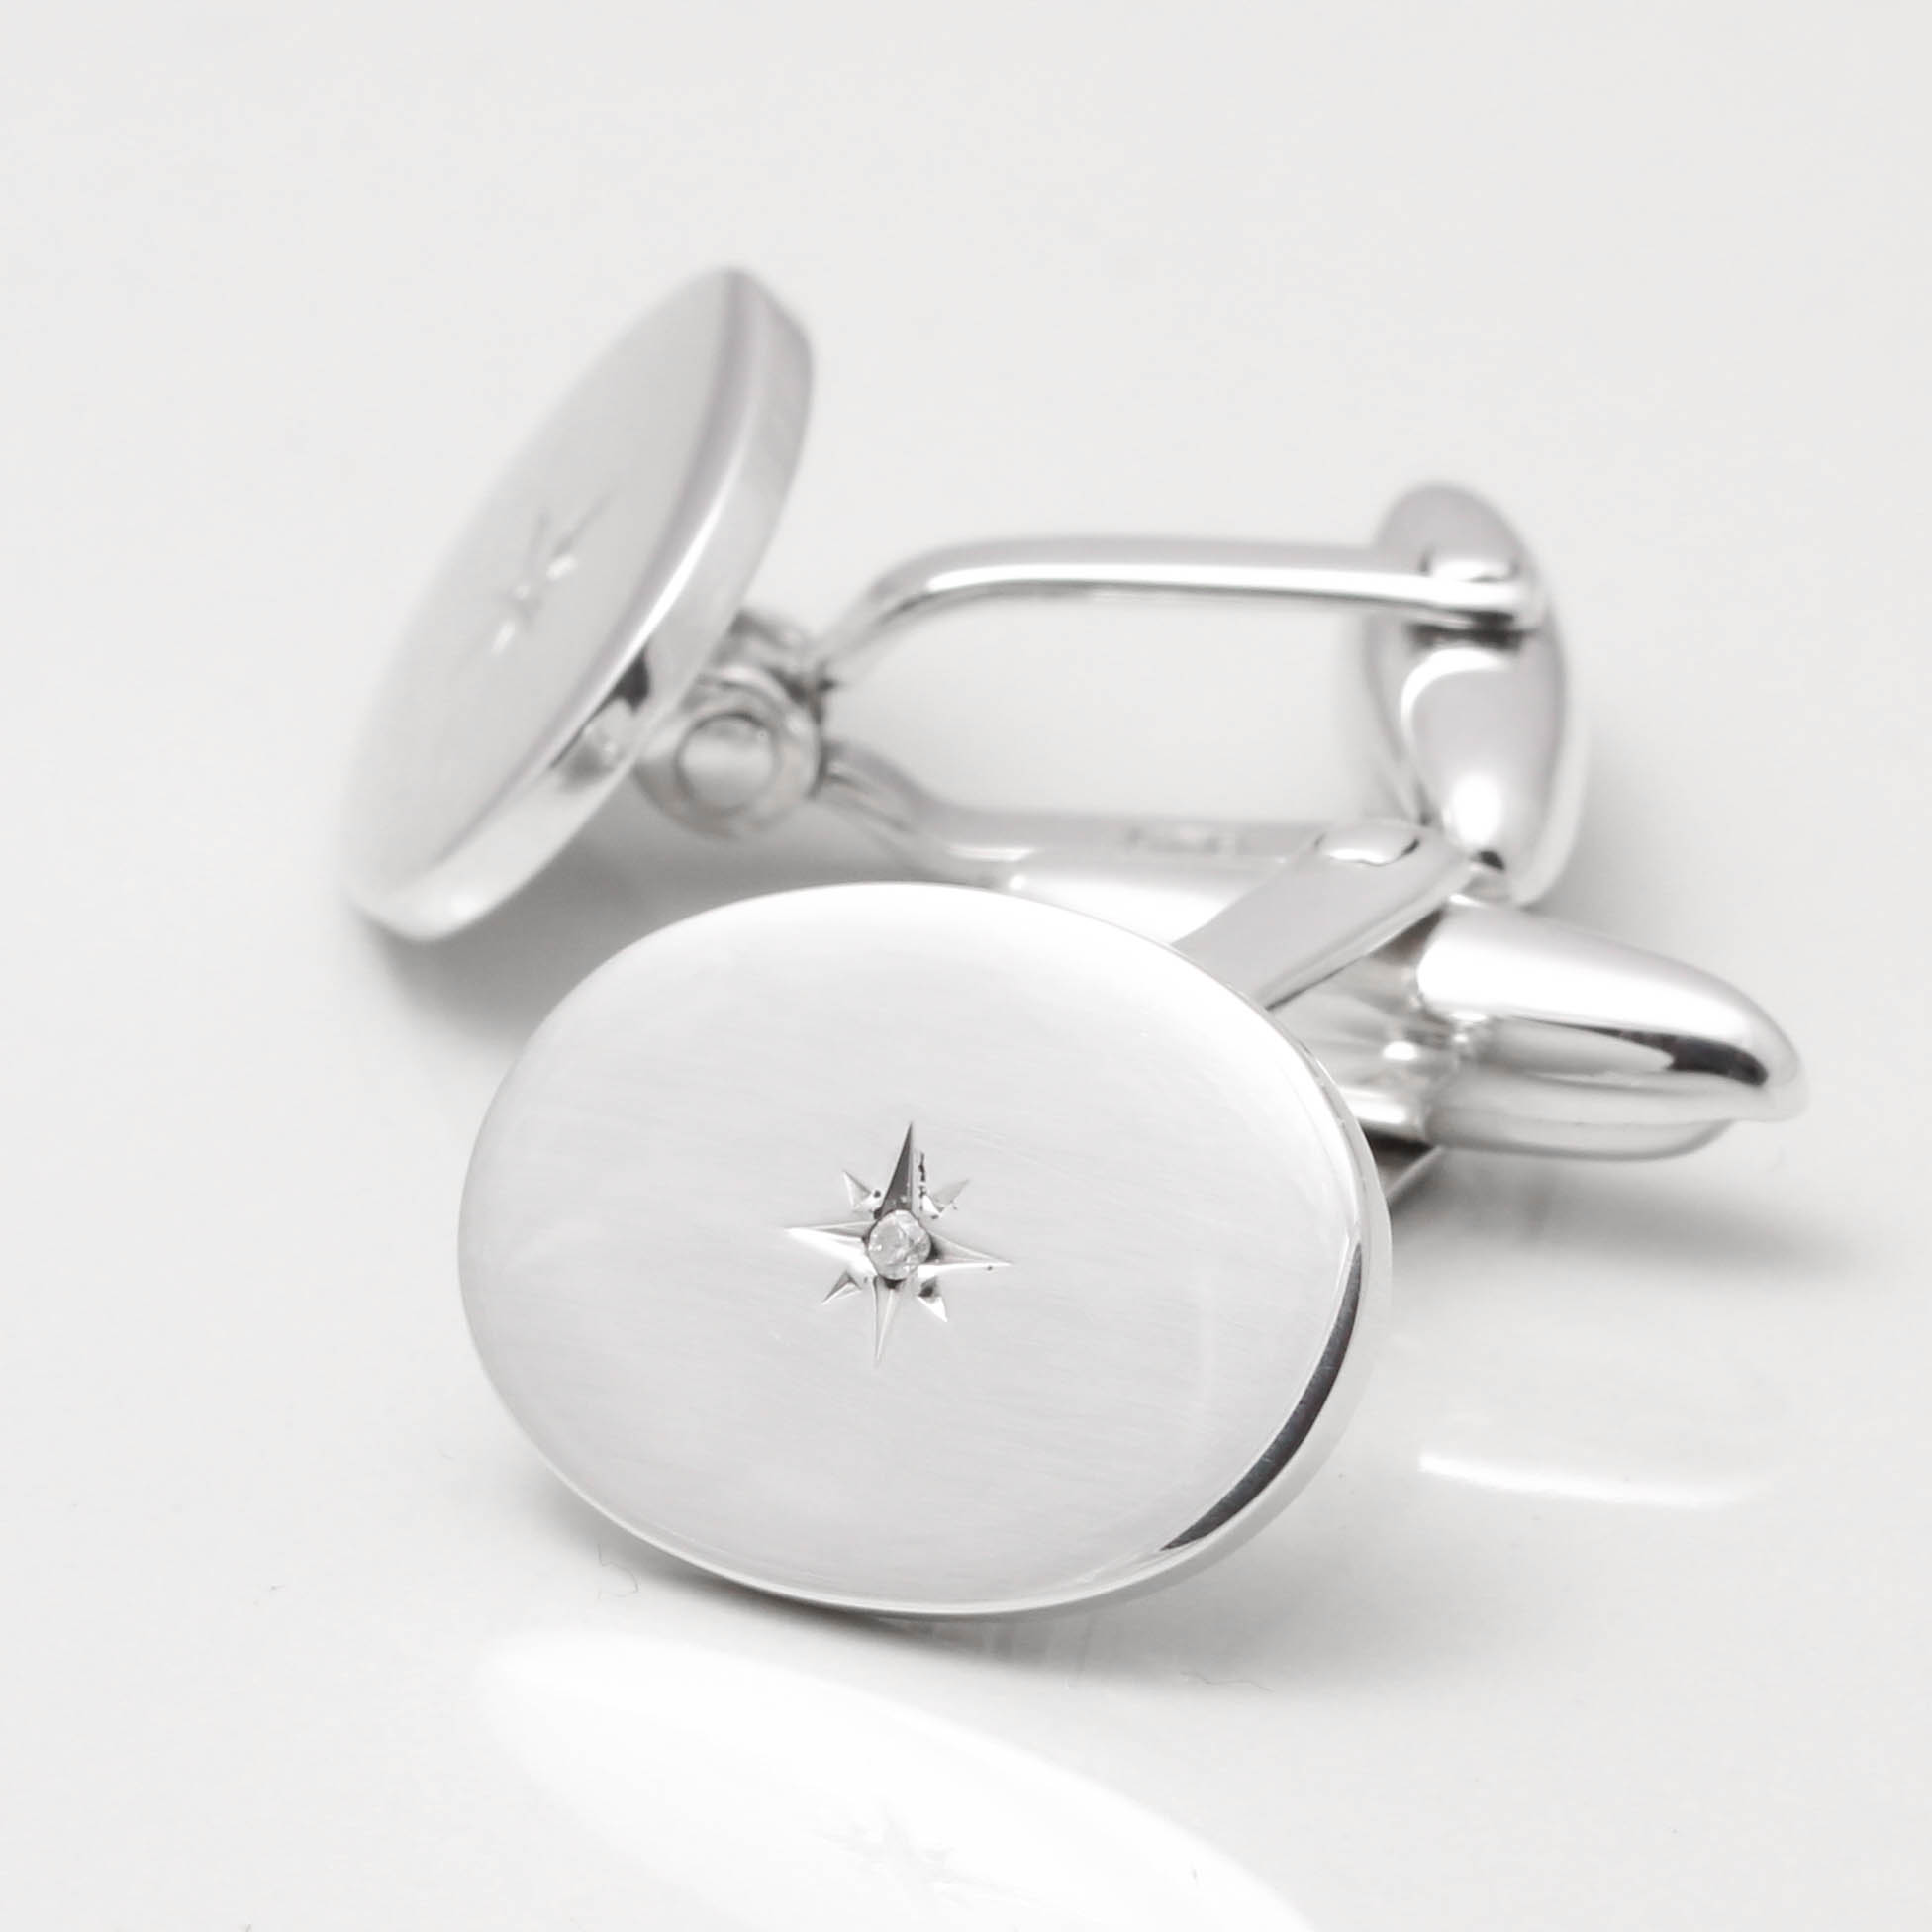 Sterling Silver Diamond Cufflinks by Badger  Brown